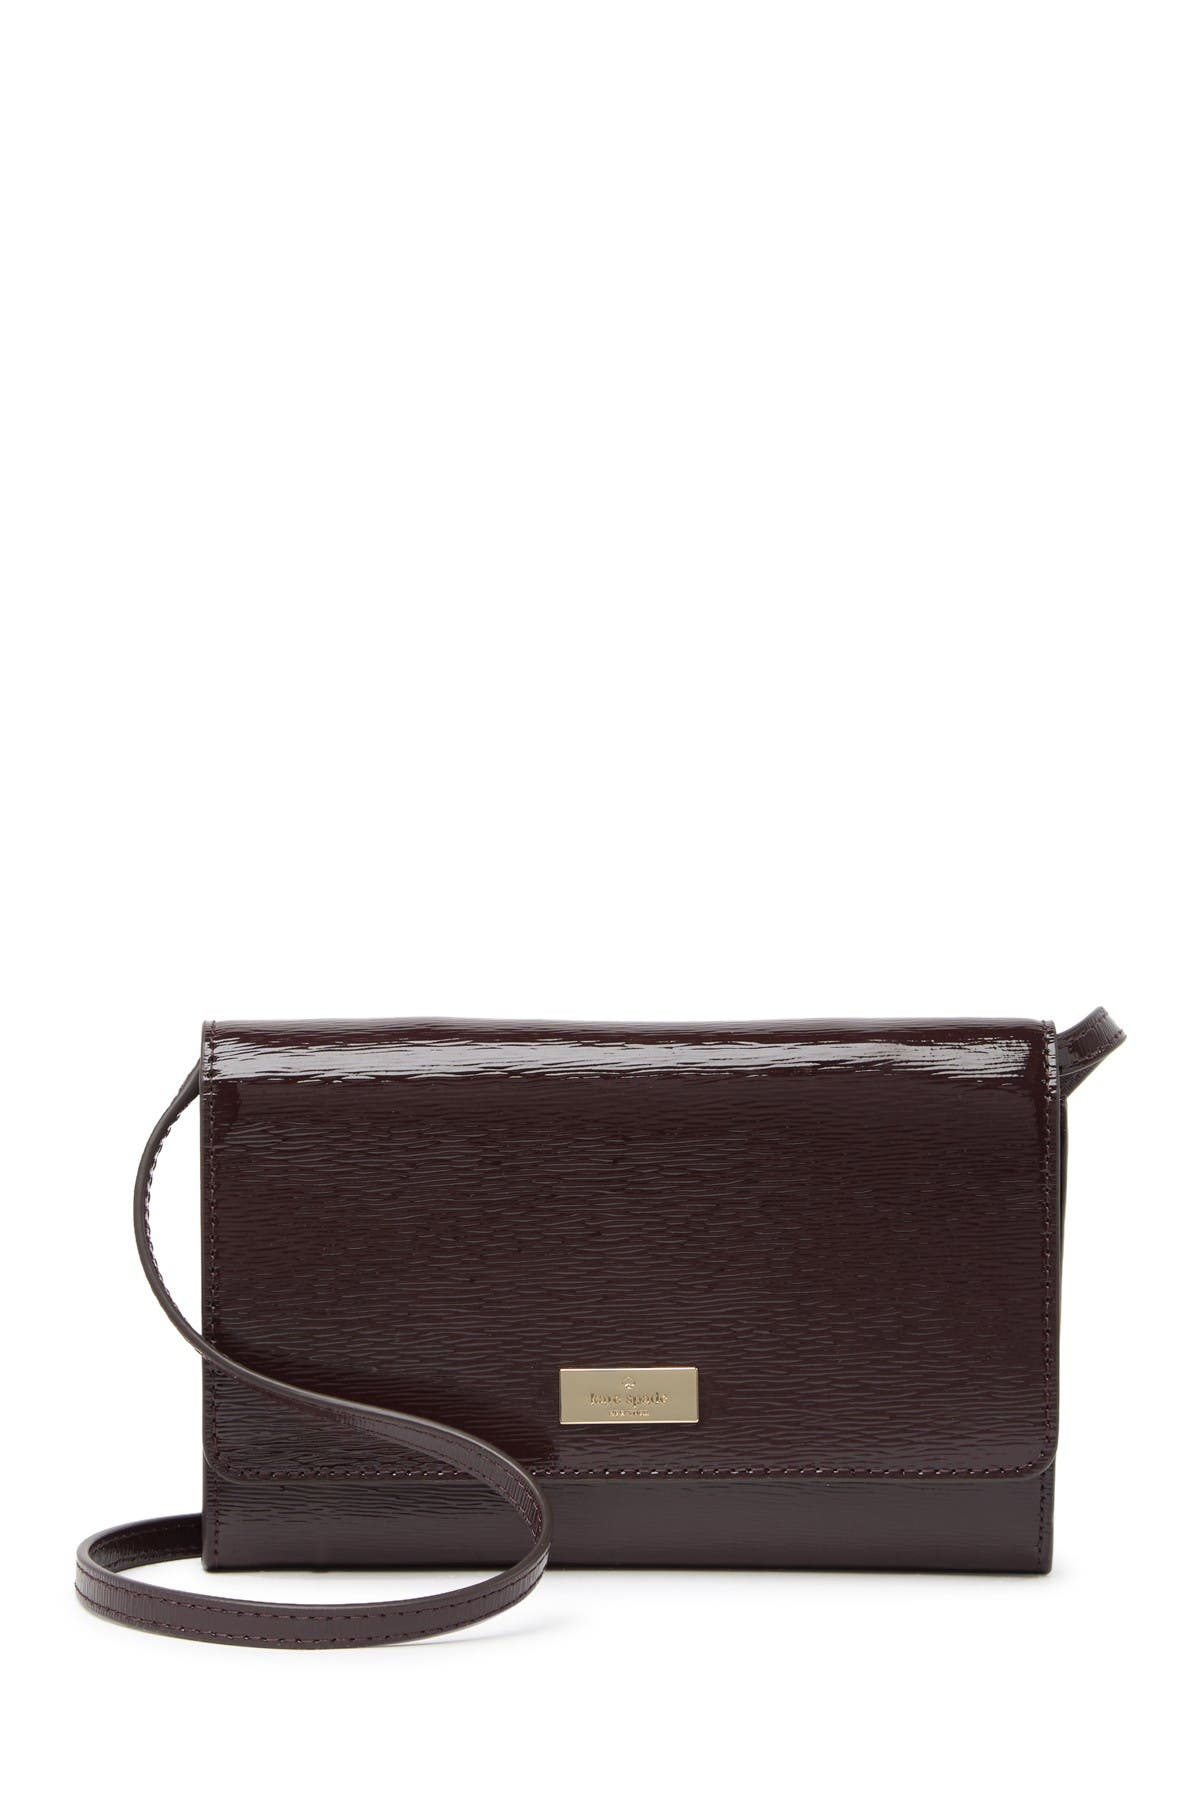 Image of kate spade new york leather summer crossbody bag